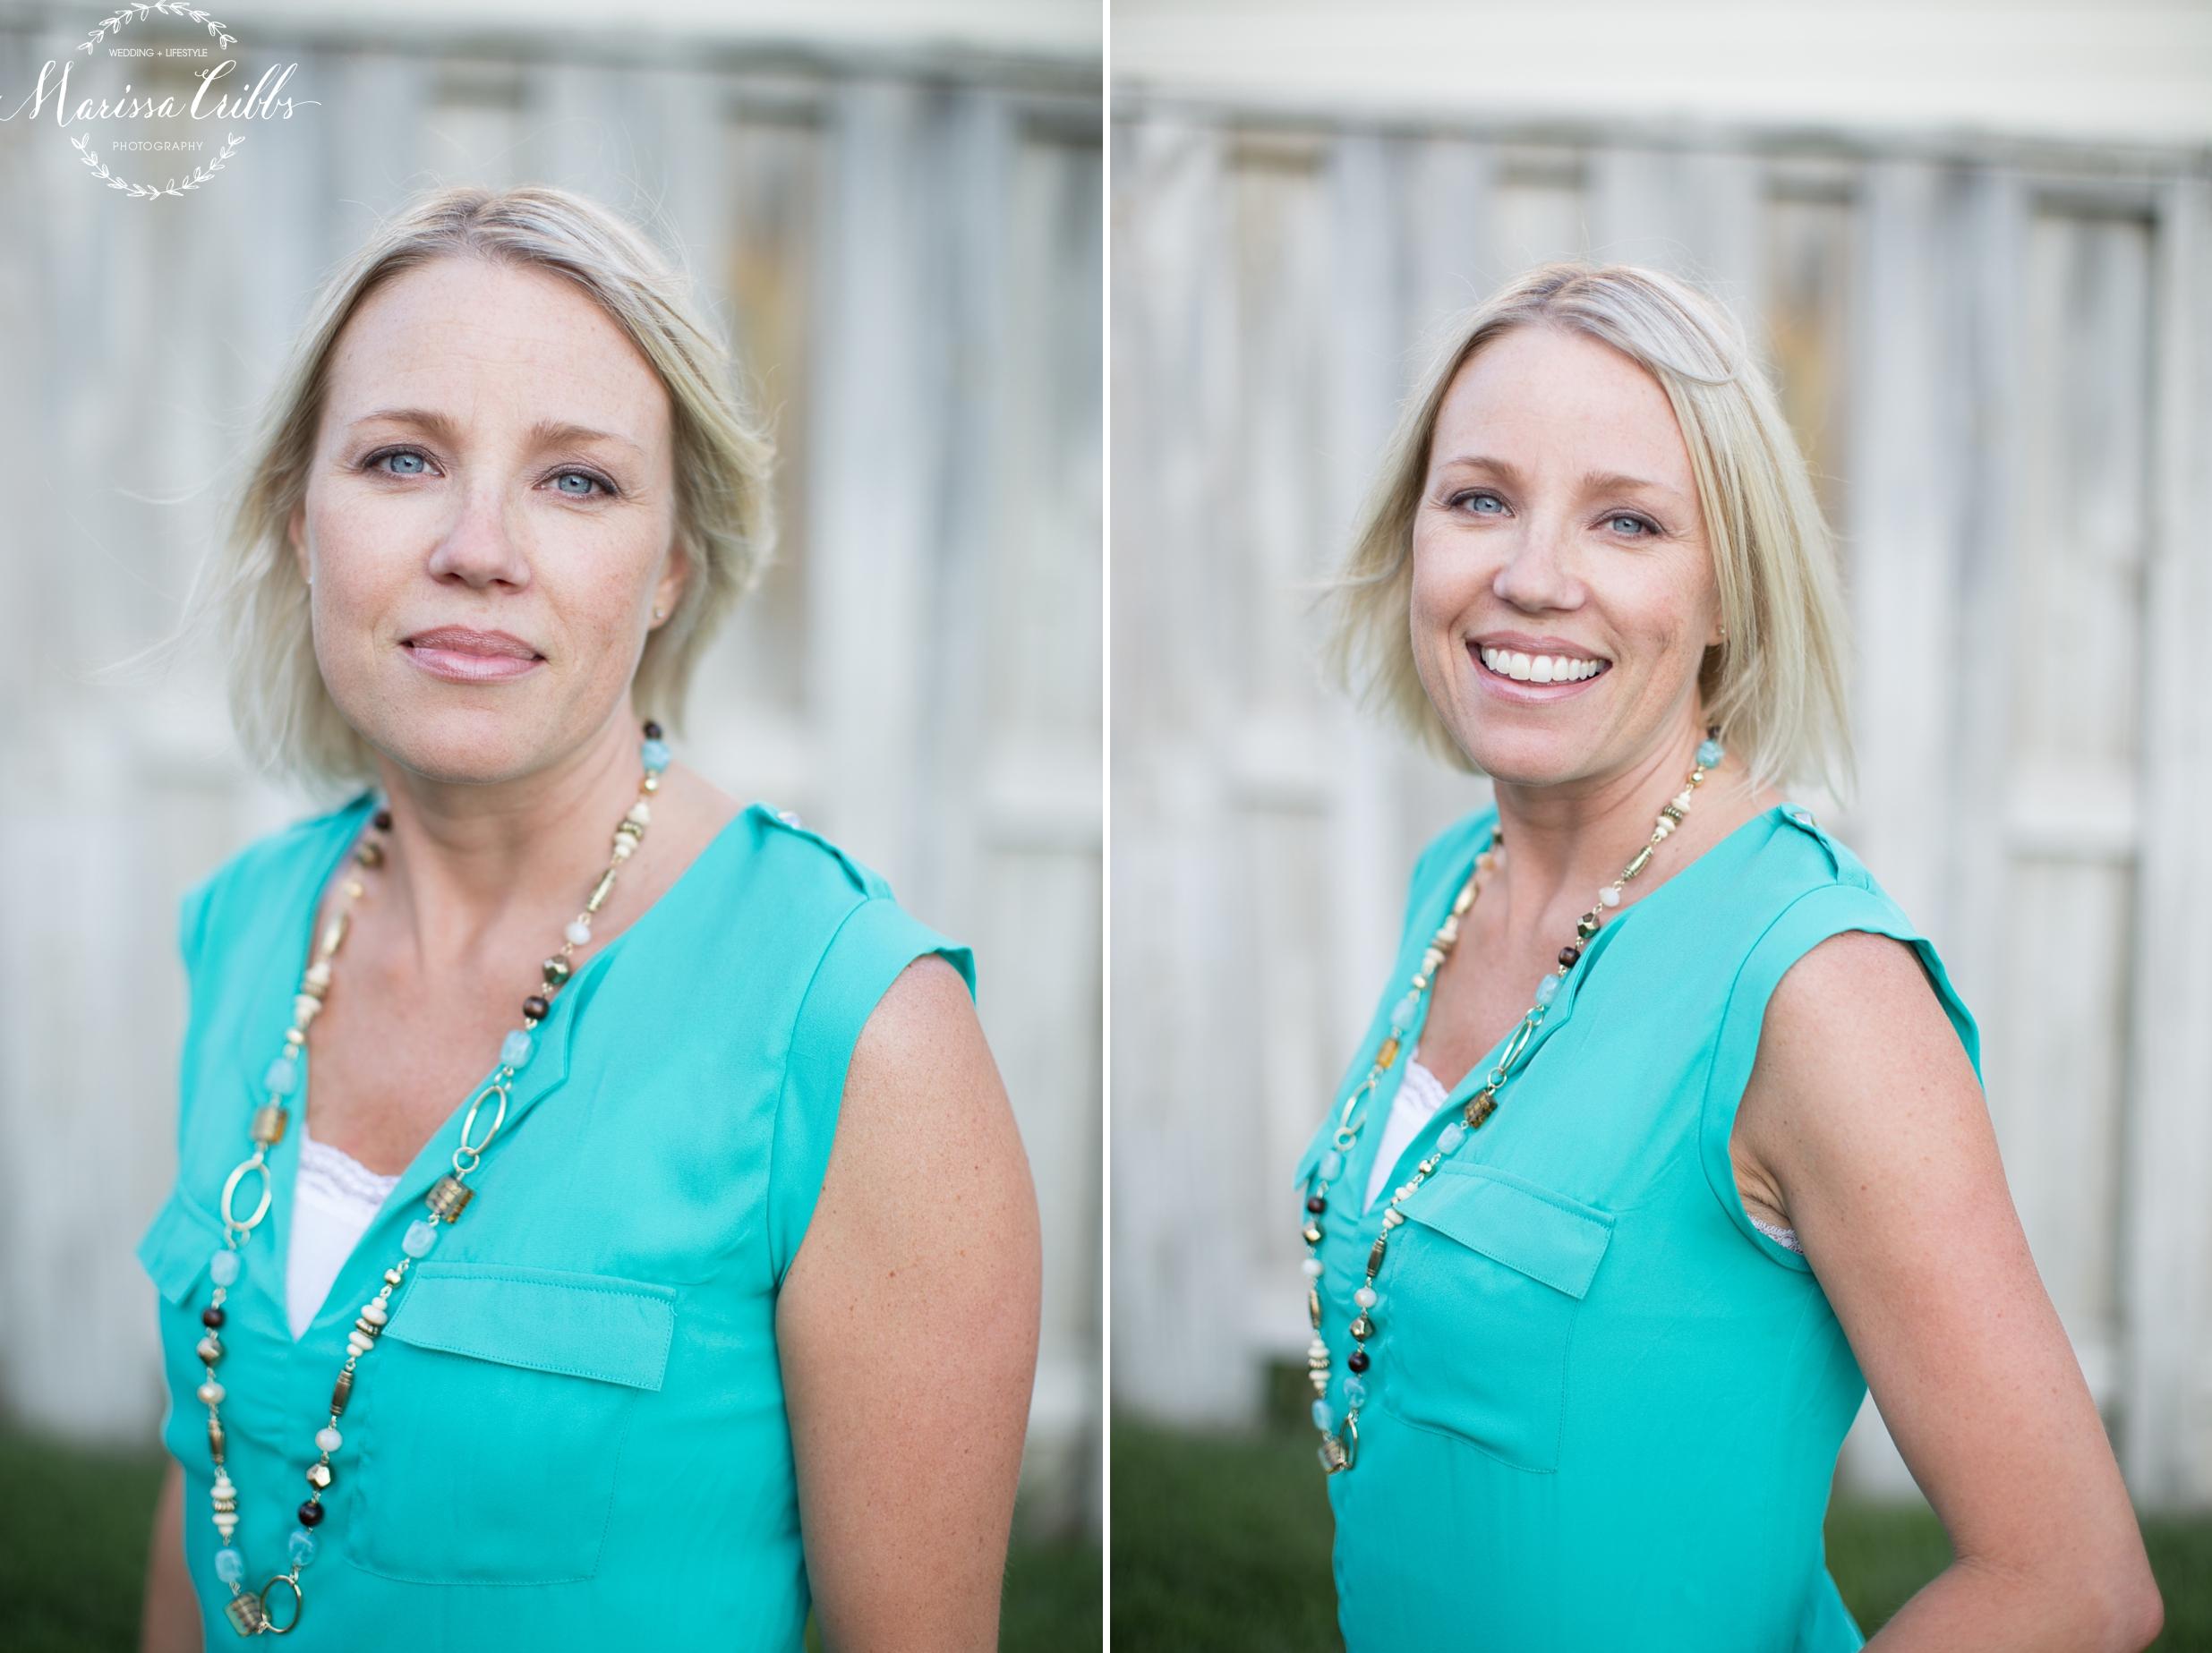 Head Shots | Marissa Cribbs Photography